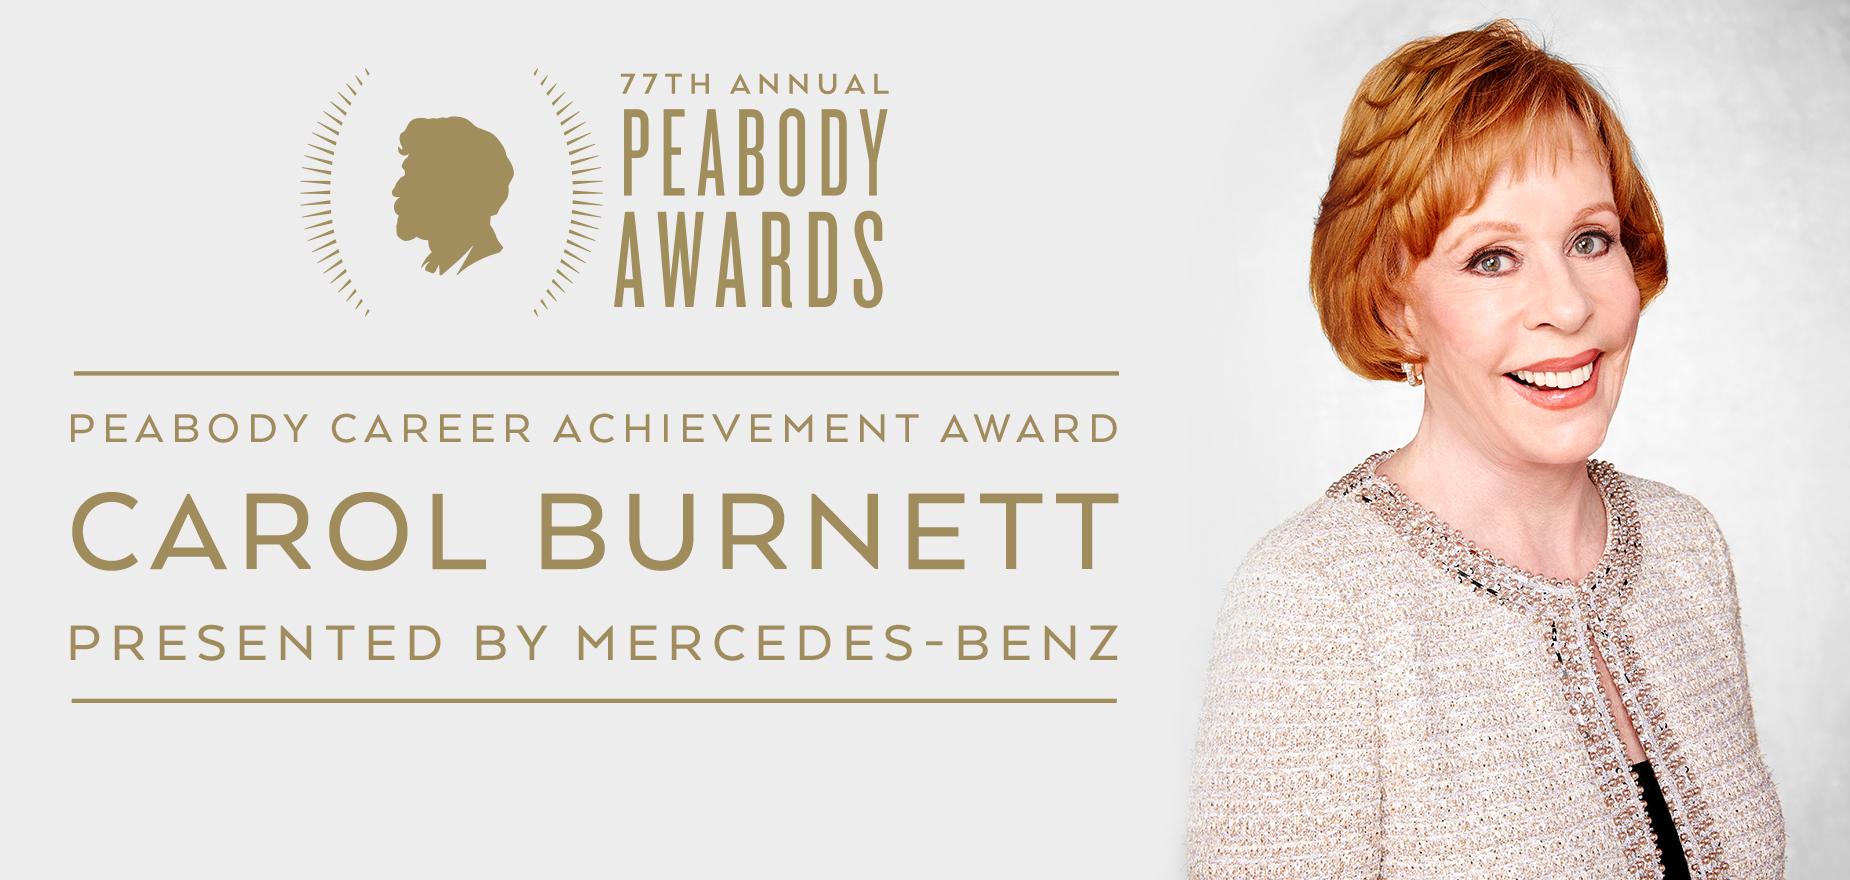 Career Achievement Award: Carol Burnett, presented by Mercedes-Benz